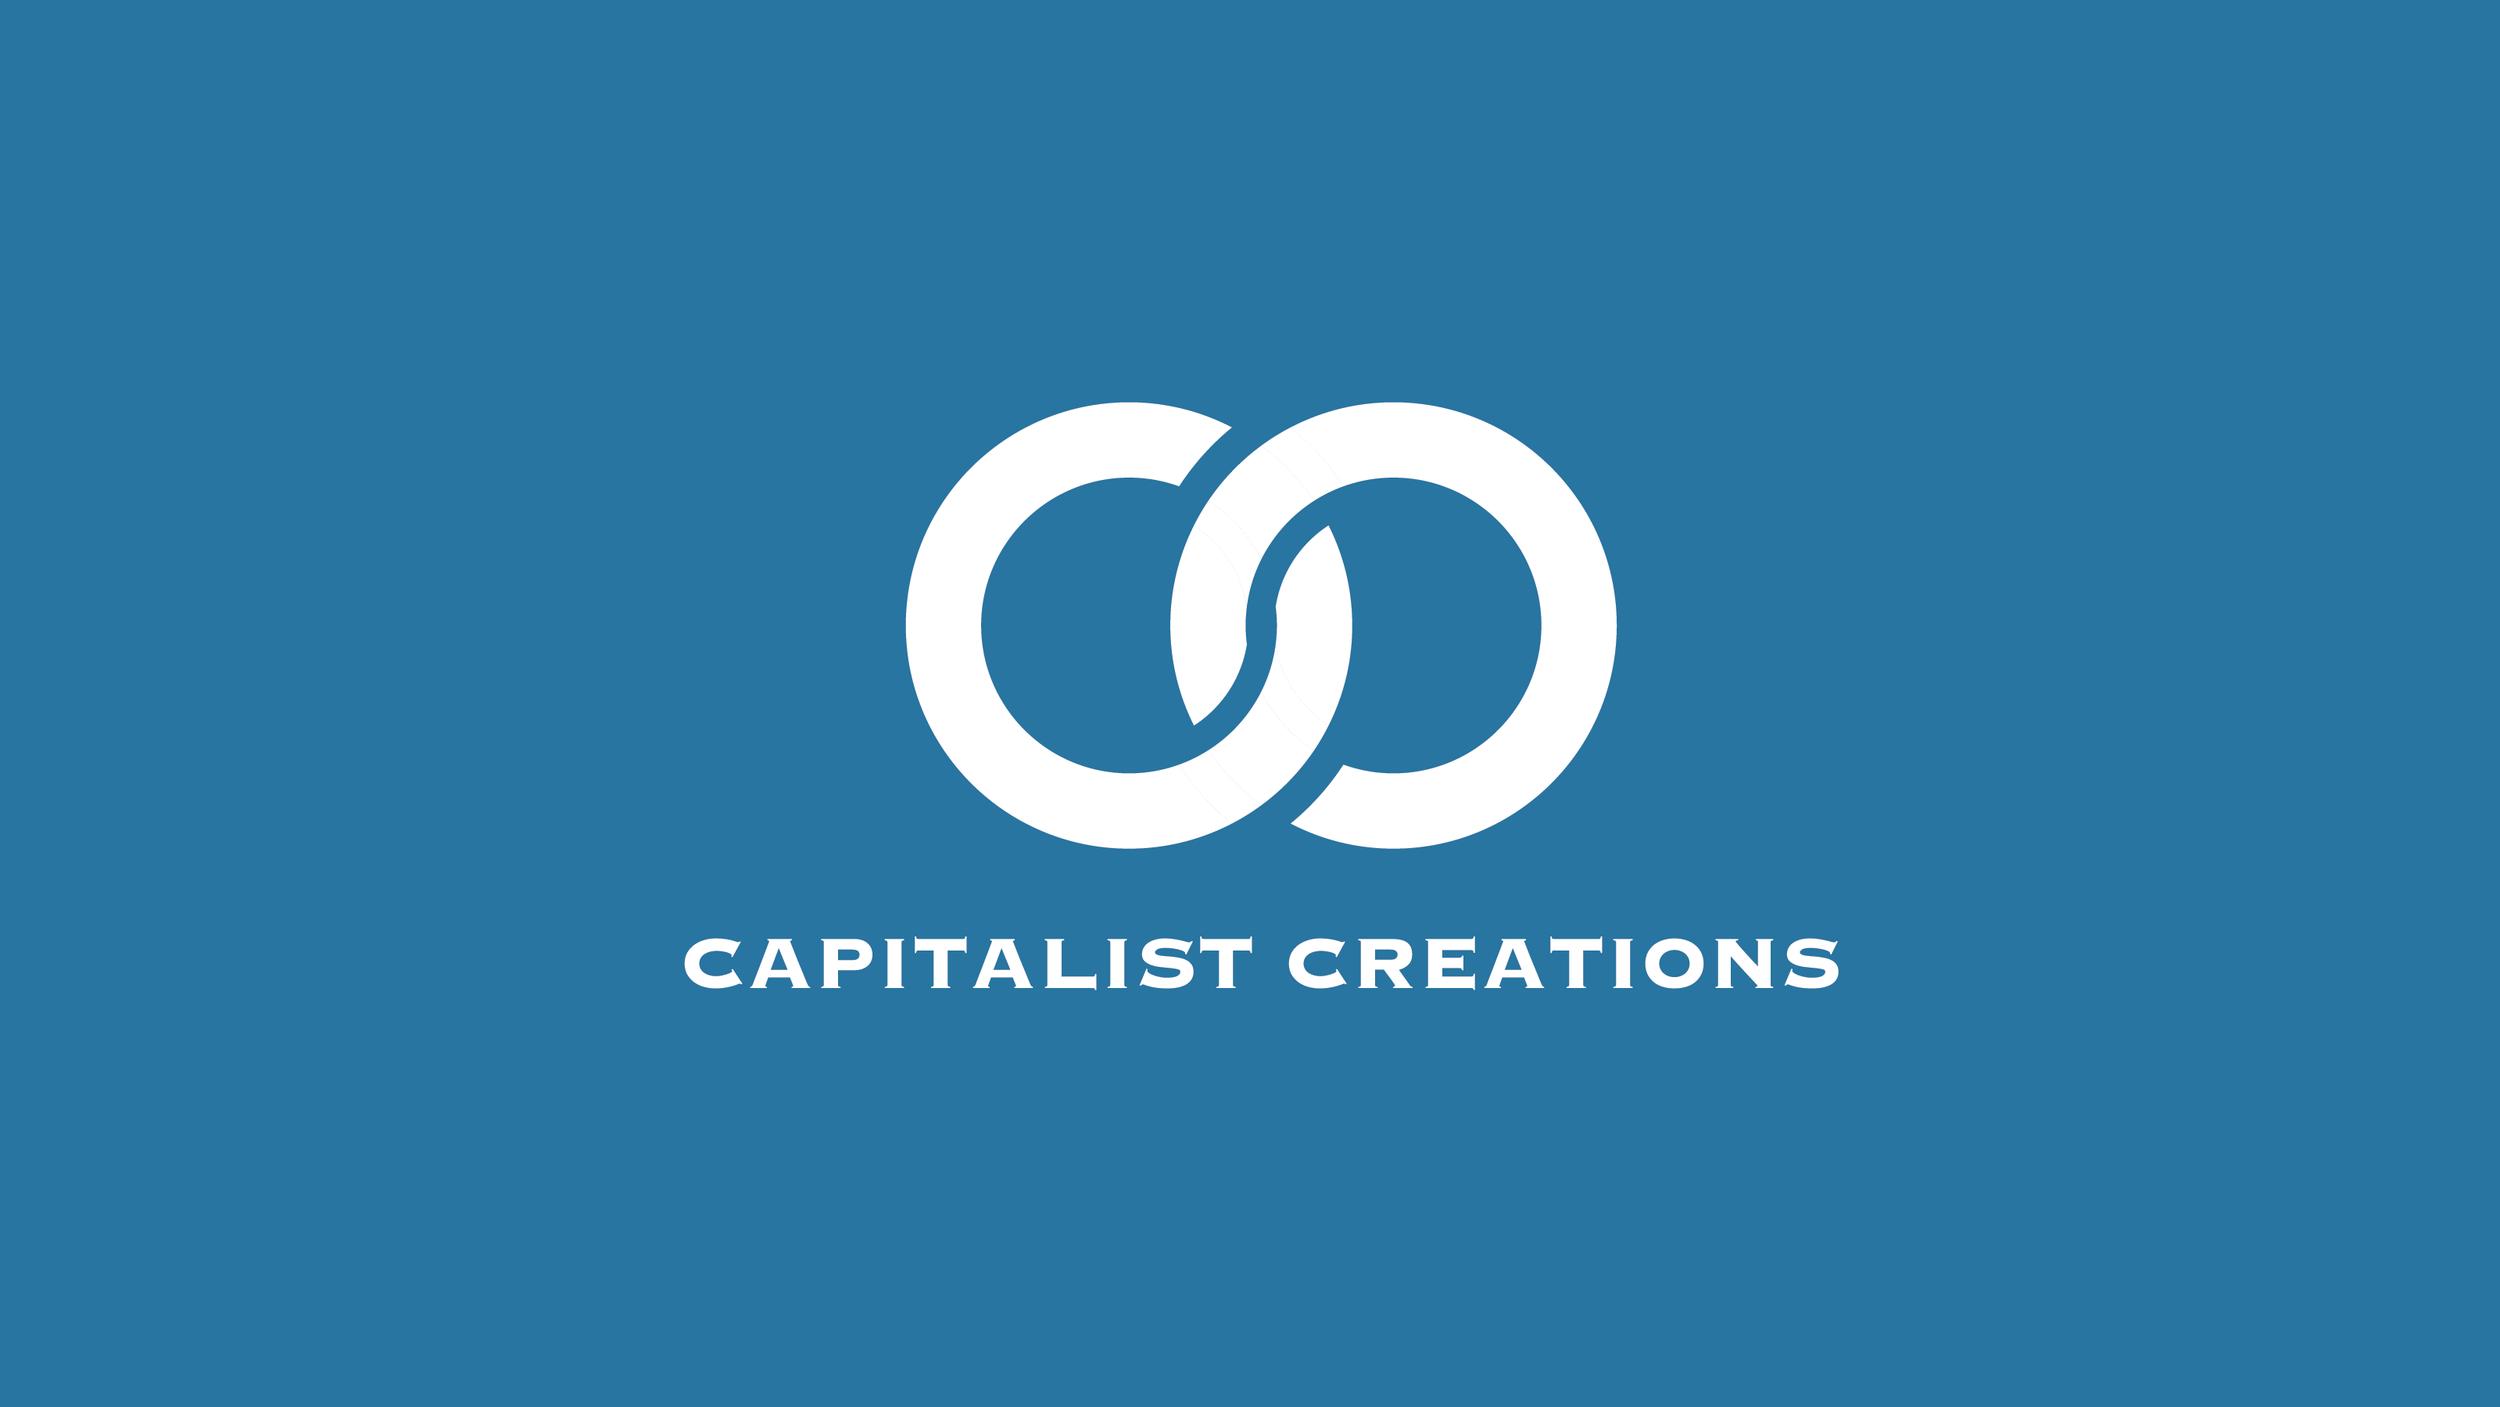 capitalist-creations.png